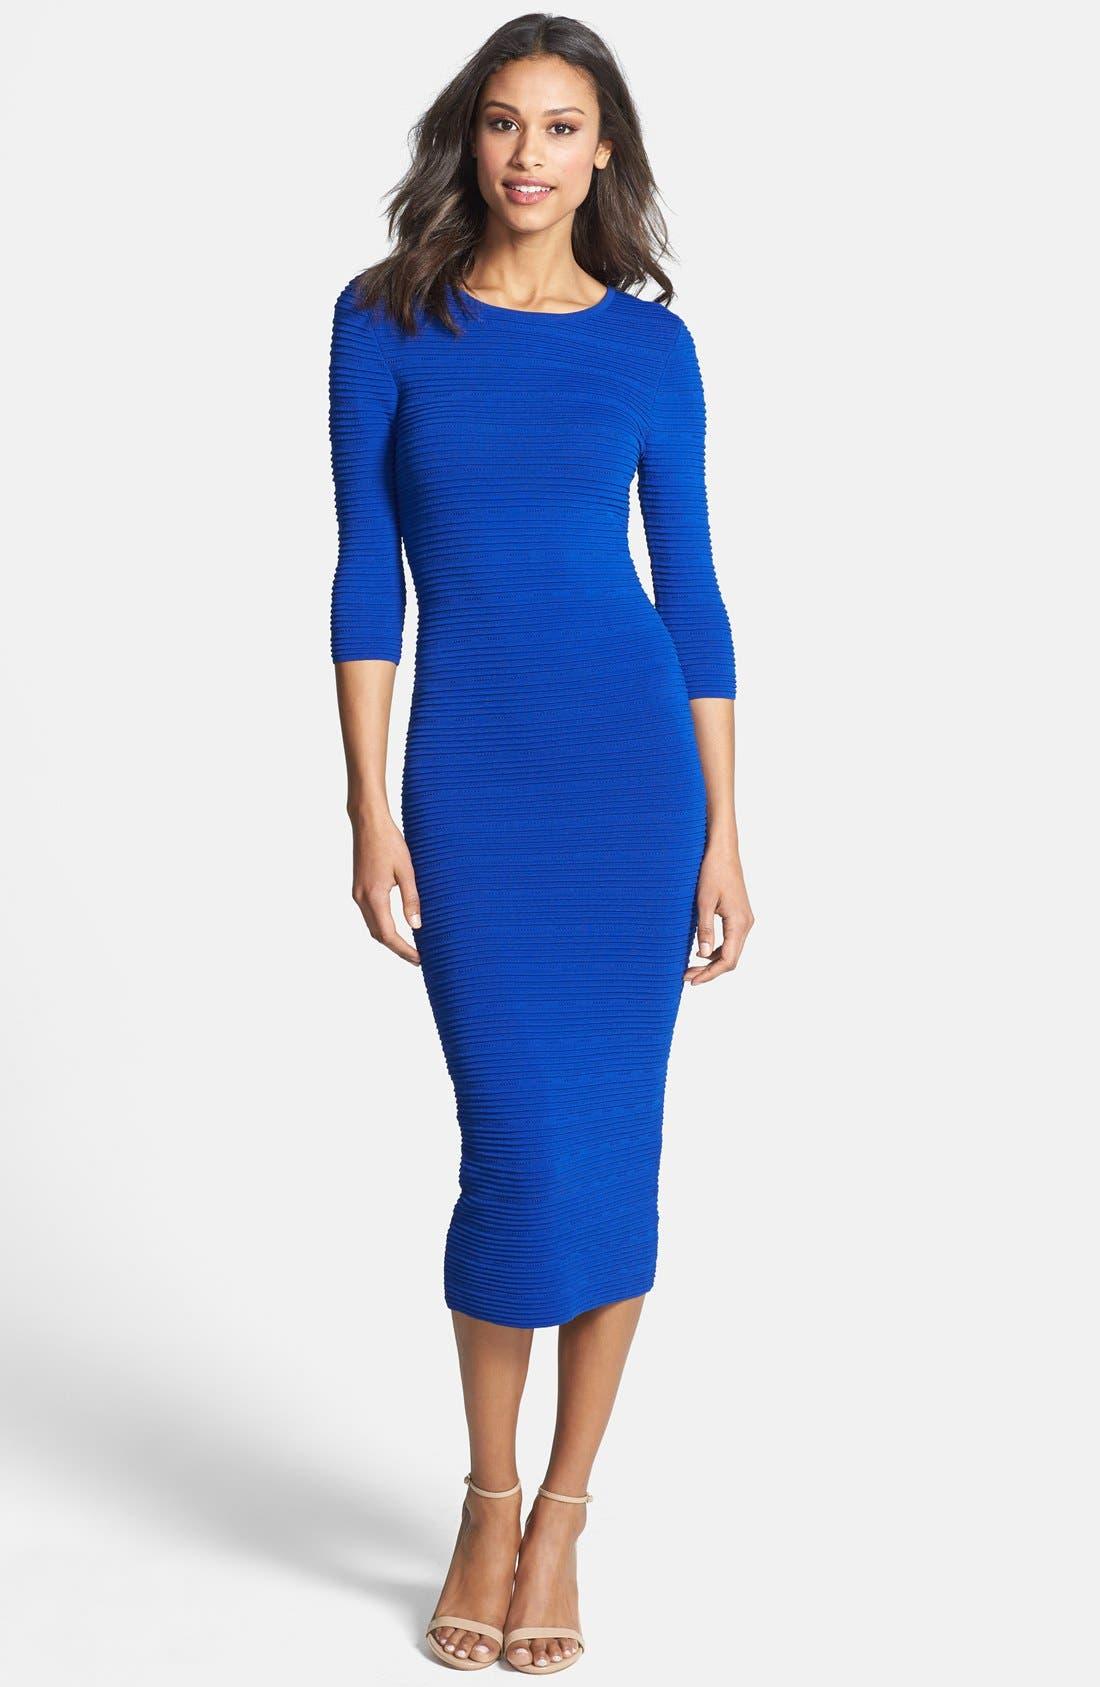 Main Image - Felicity & Coco Knit Body-Con Midi Dress (Petite) (Nordstrom Exclusive)